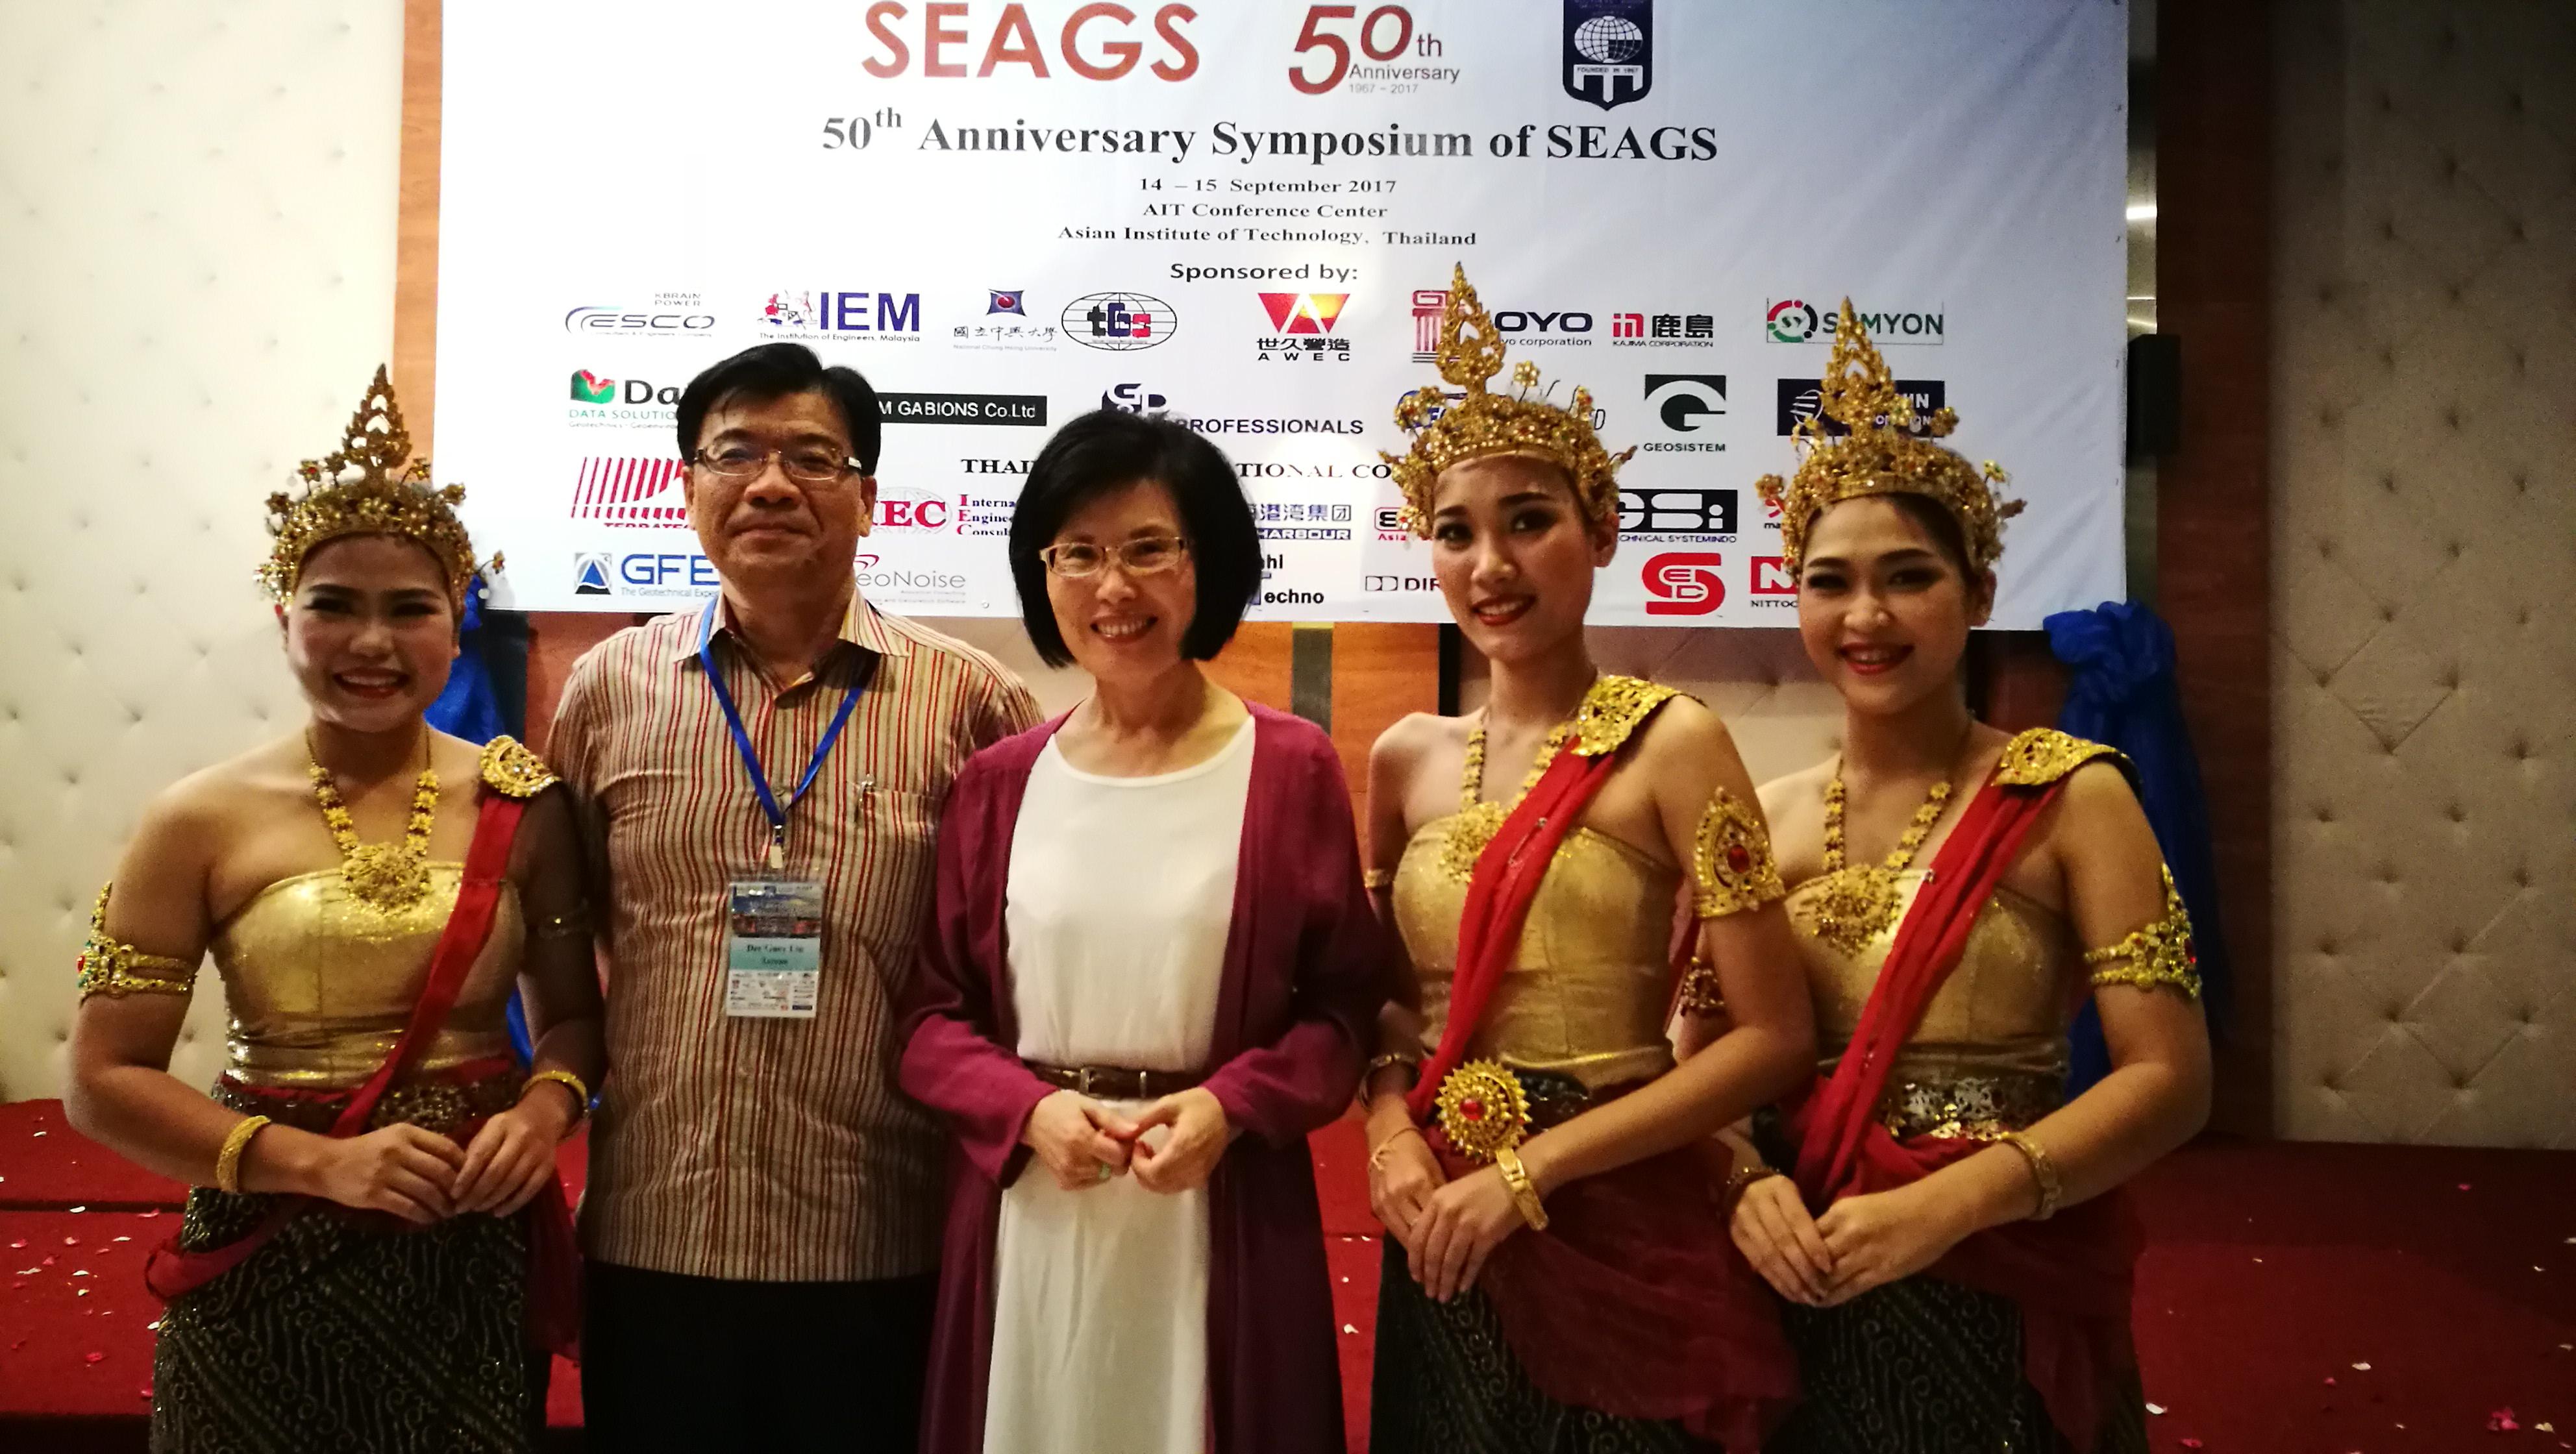 Dr. Lin Der Guy & Mrs. Lin with Cultural Dancers